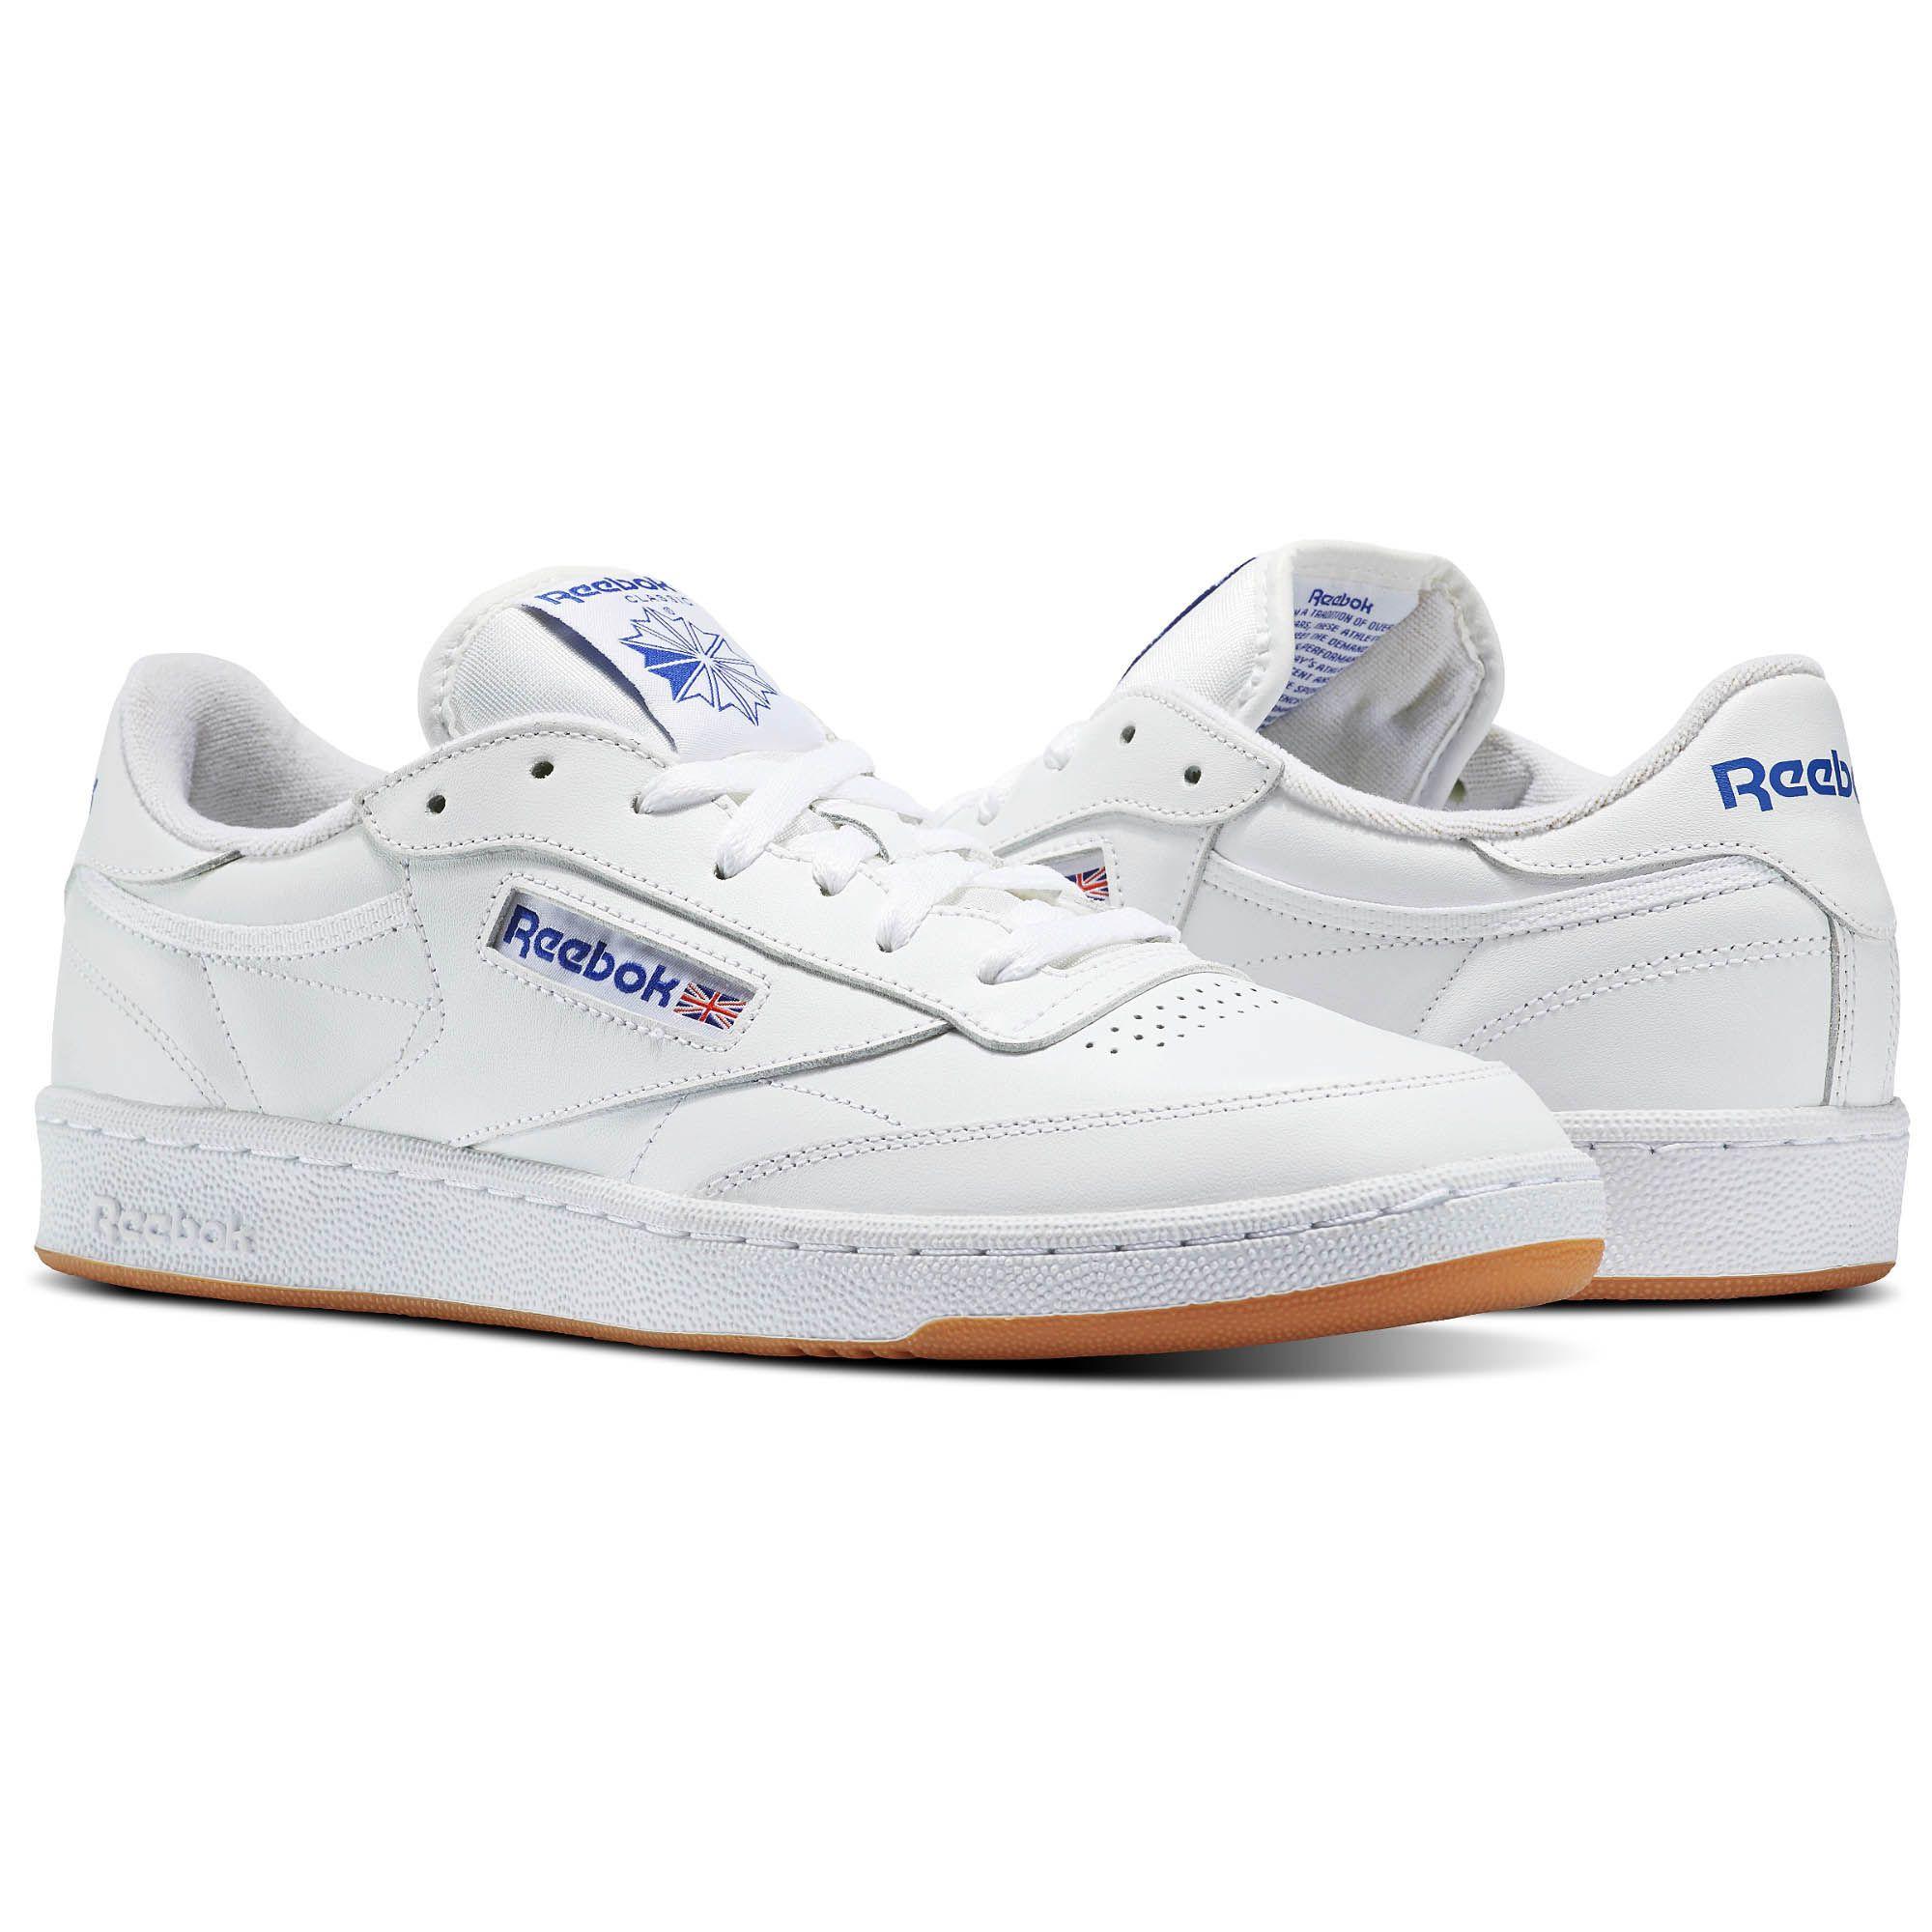 32566469fc Reebok Shoes Men's Club C 85 in White/Royal/Gum Size 4.5 - Court ...